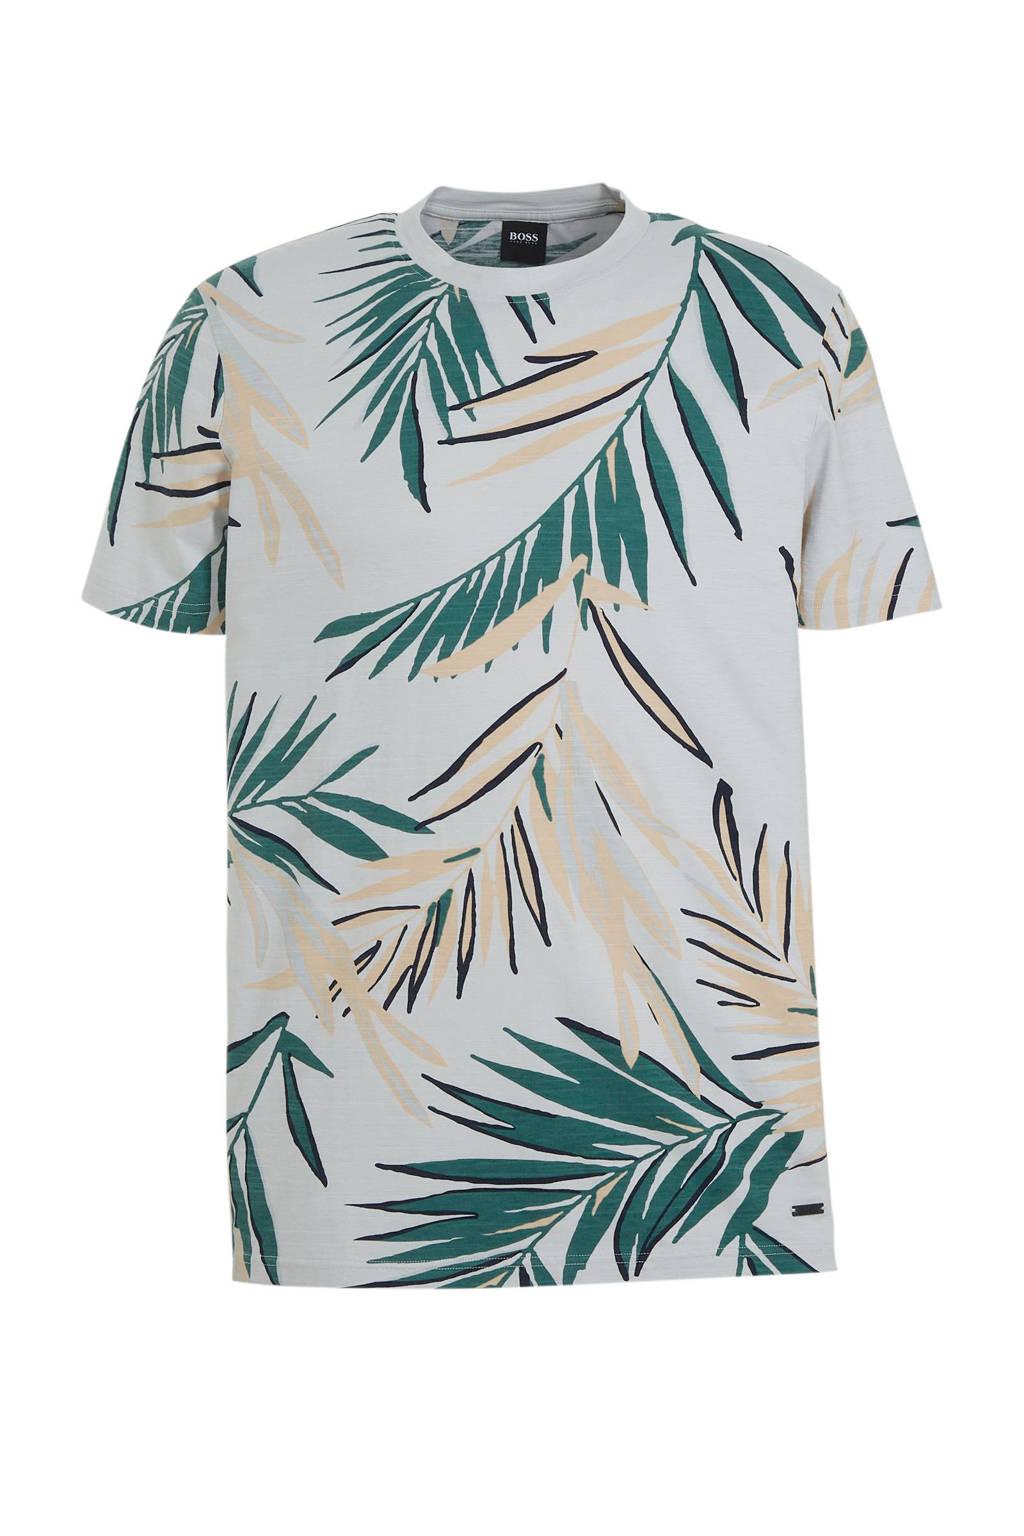 BOSS Casual T-shirt met bladprint grijs, Grijs